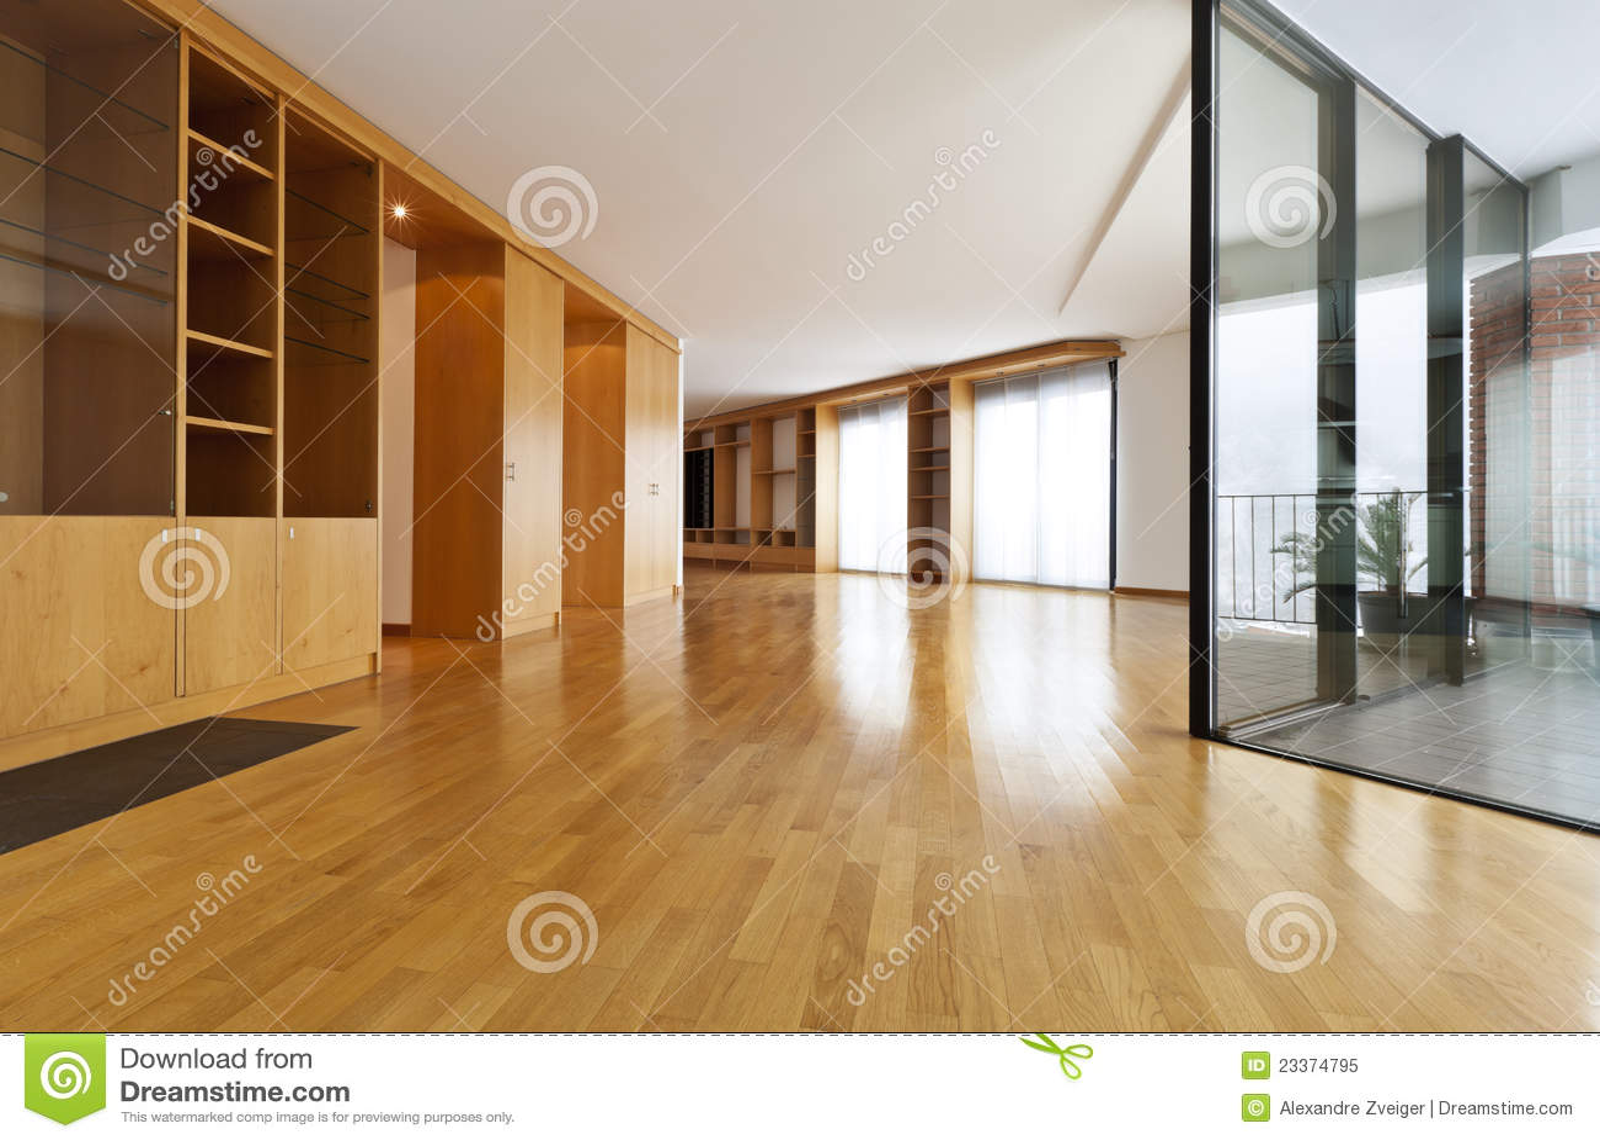 Beautiful apartment interior royalty free stock photo for Beautiful flats interior